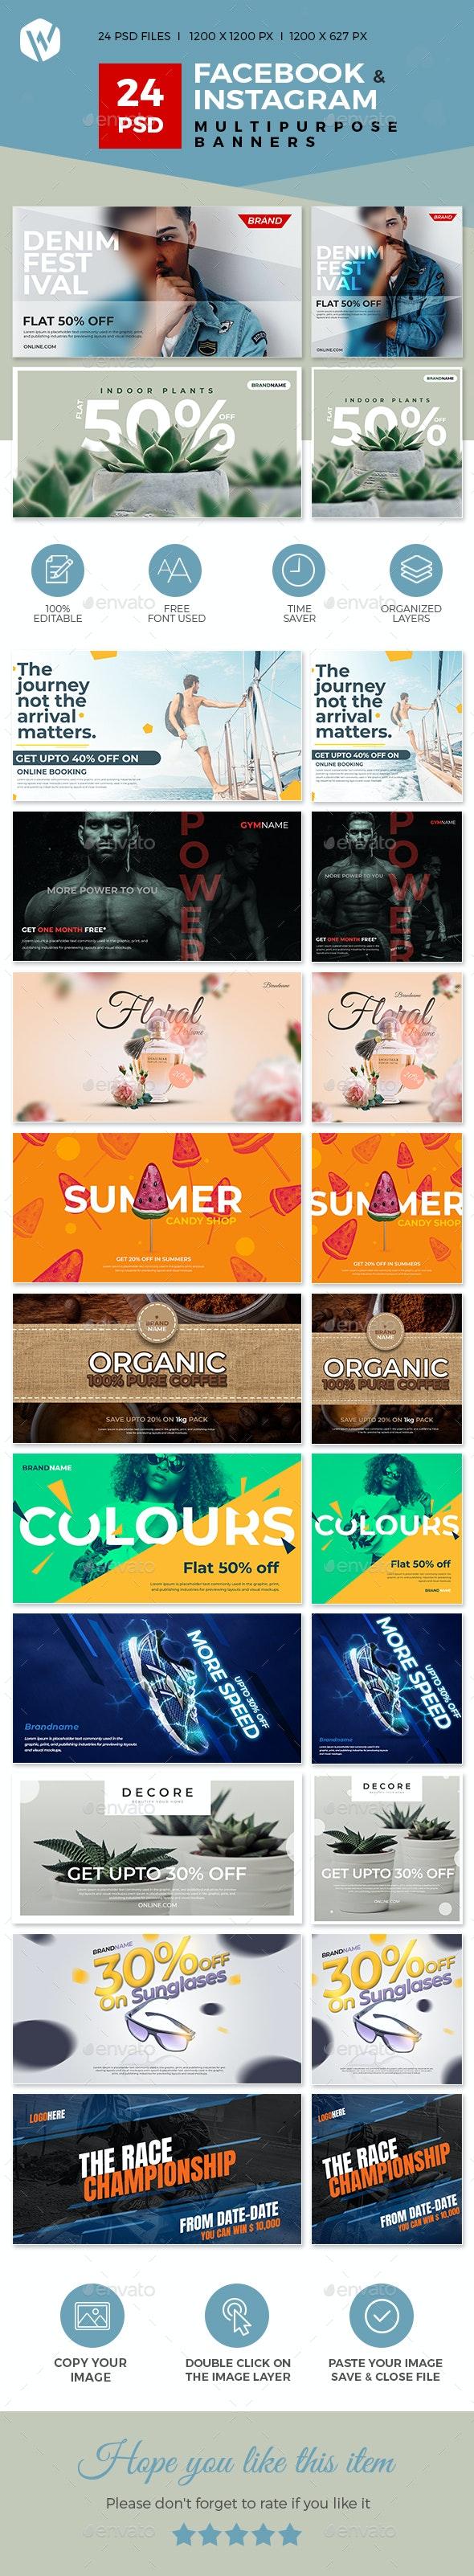 24 Facebook & Instagram Multipurpose Banners - Social Media Web Elements